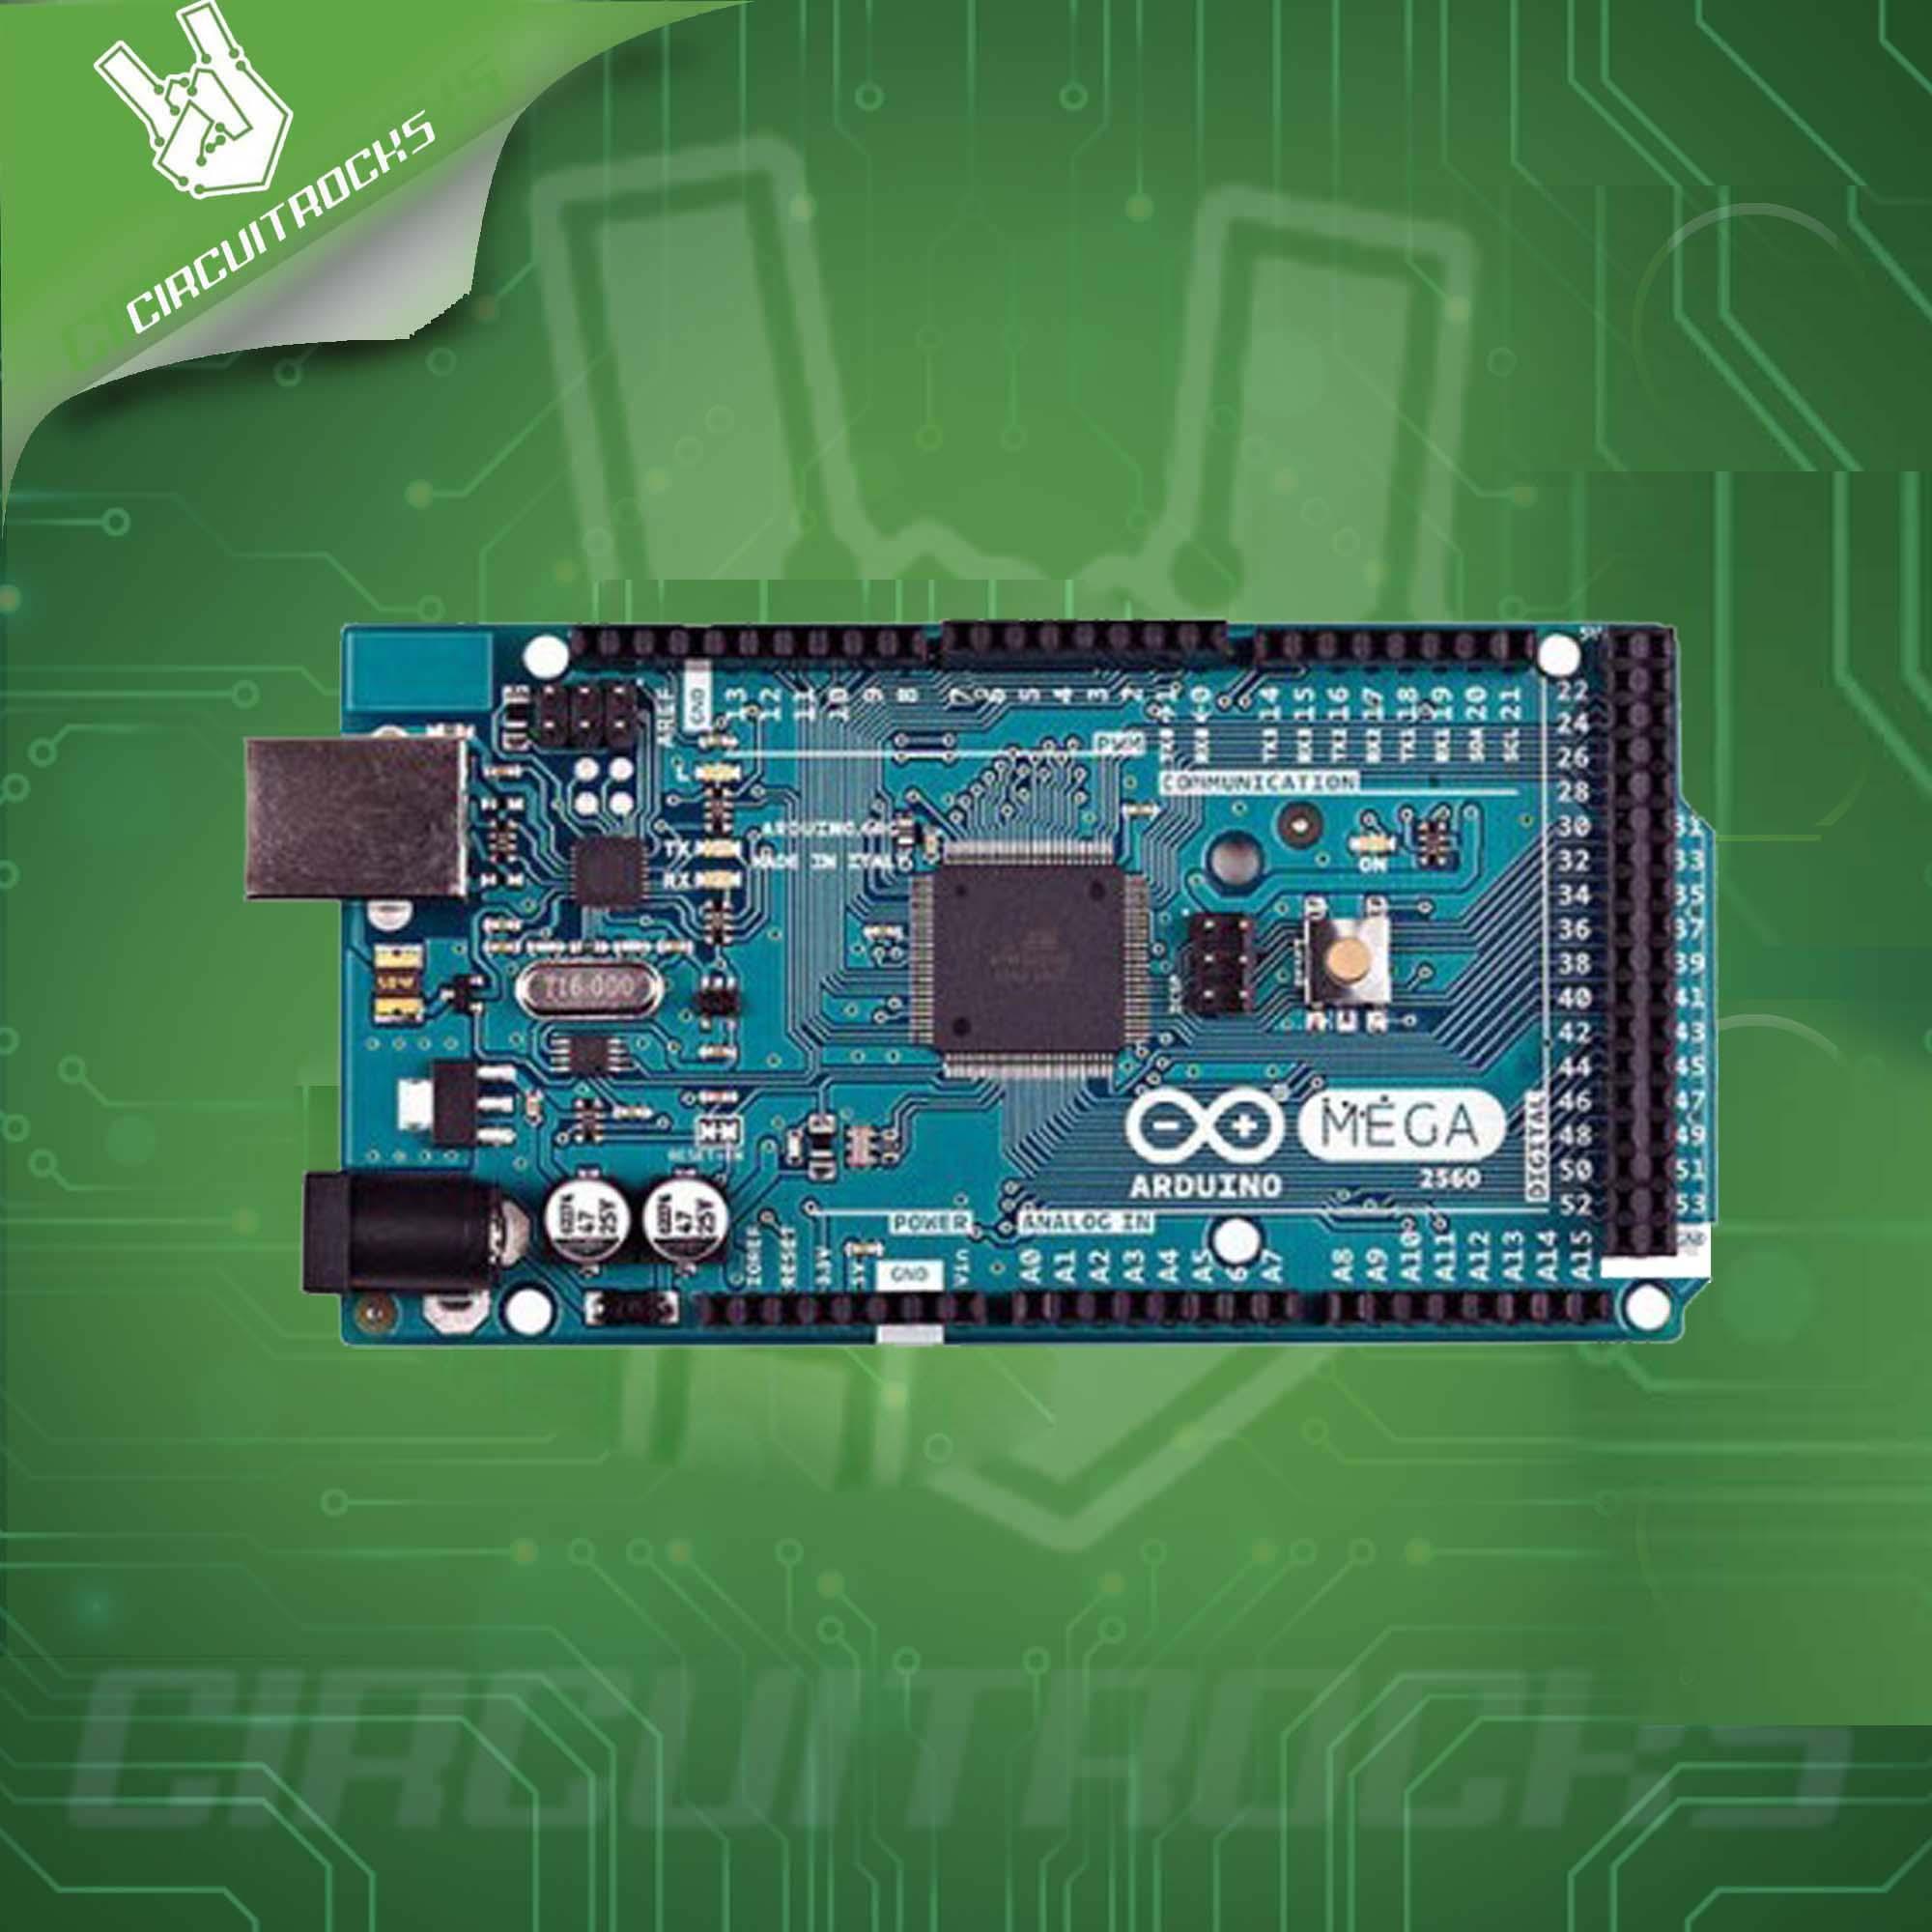 Arduino Philippines Price List Motherboard For Sale Lazada Temperature Controlled Relay 8211 Tutorial 6 Mega 2560 Rev3 Original Italy